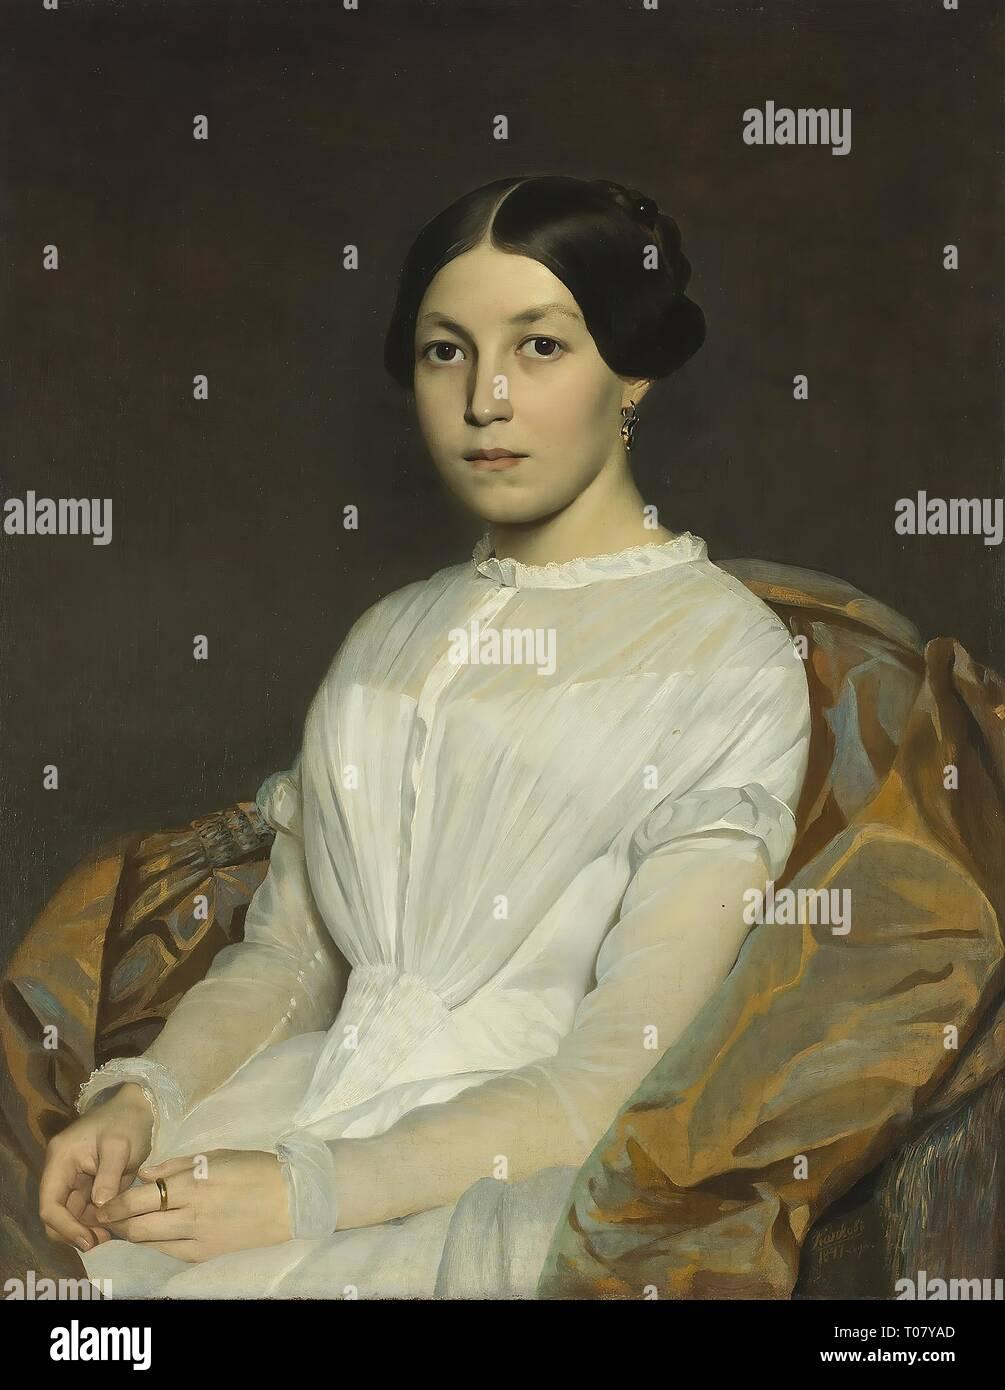 'Portrait of Alexandra Kutorga'. Russia, 1847. Dimensions: 80x62,5 cm. Museum: State Hermitage, St. Petersburg. Author: Yakov Kapkov. Stock Photo